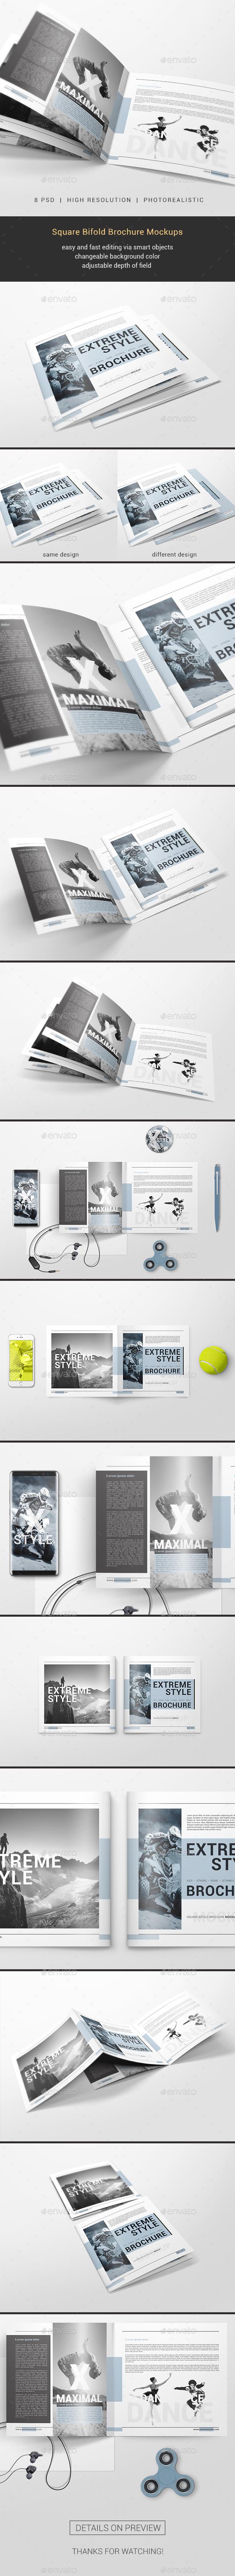 GraphicRiver Square Bifold Brochure Mockups 20869552